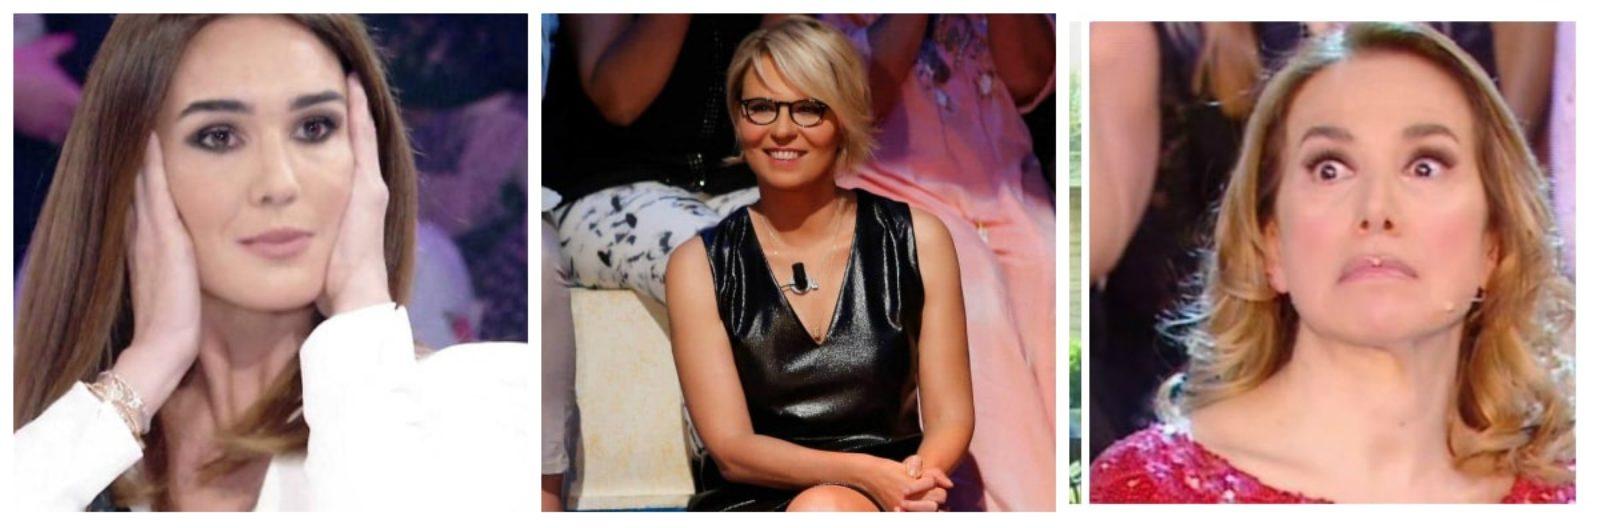 Scontro donne Mediaset